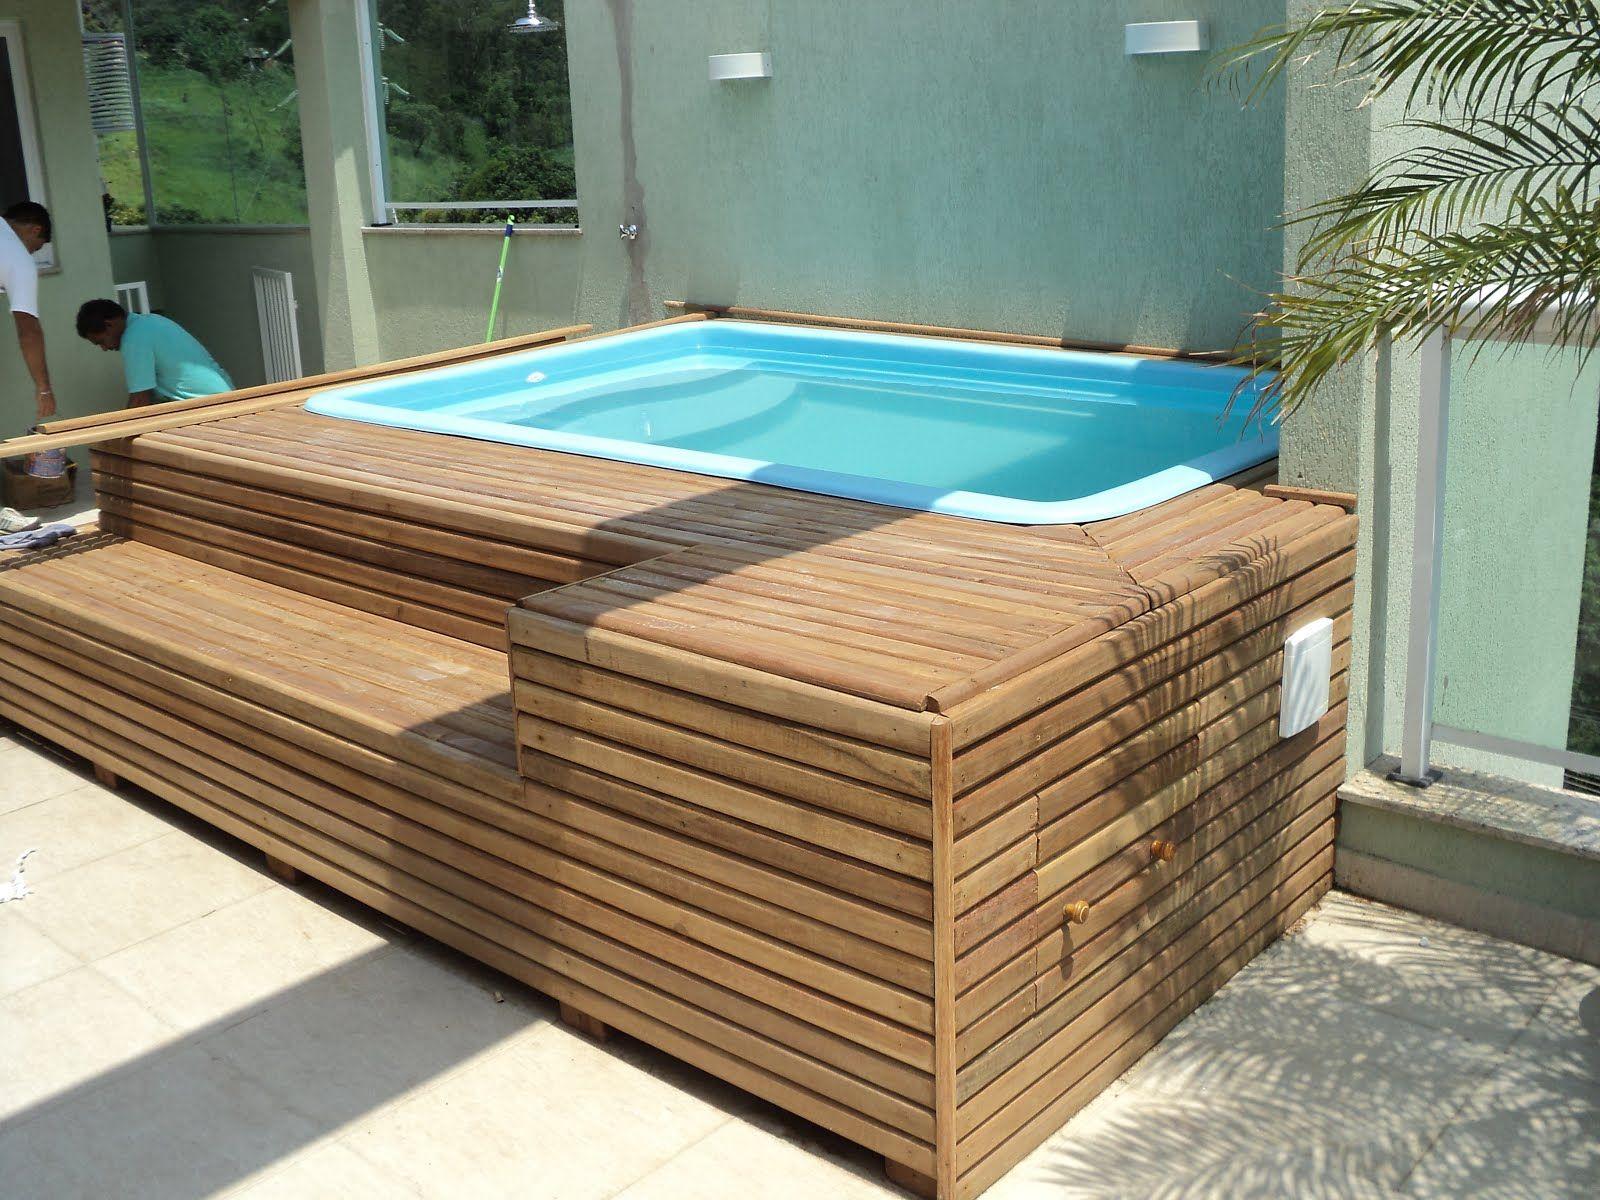 piscina de fibra pequena com deck